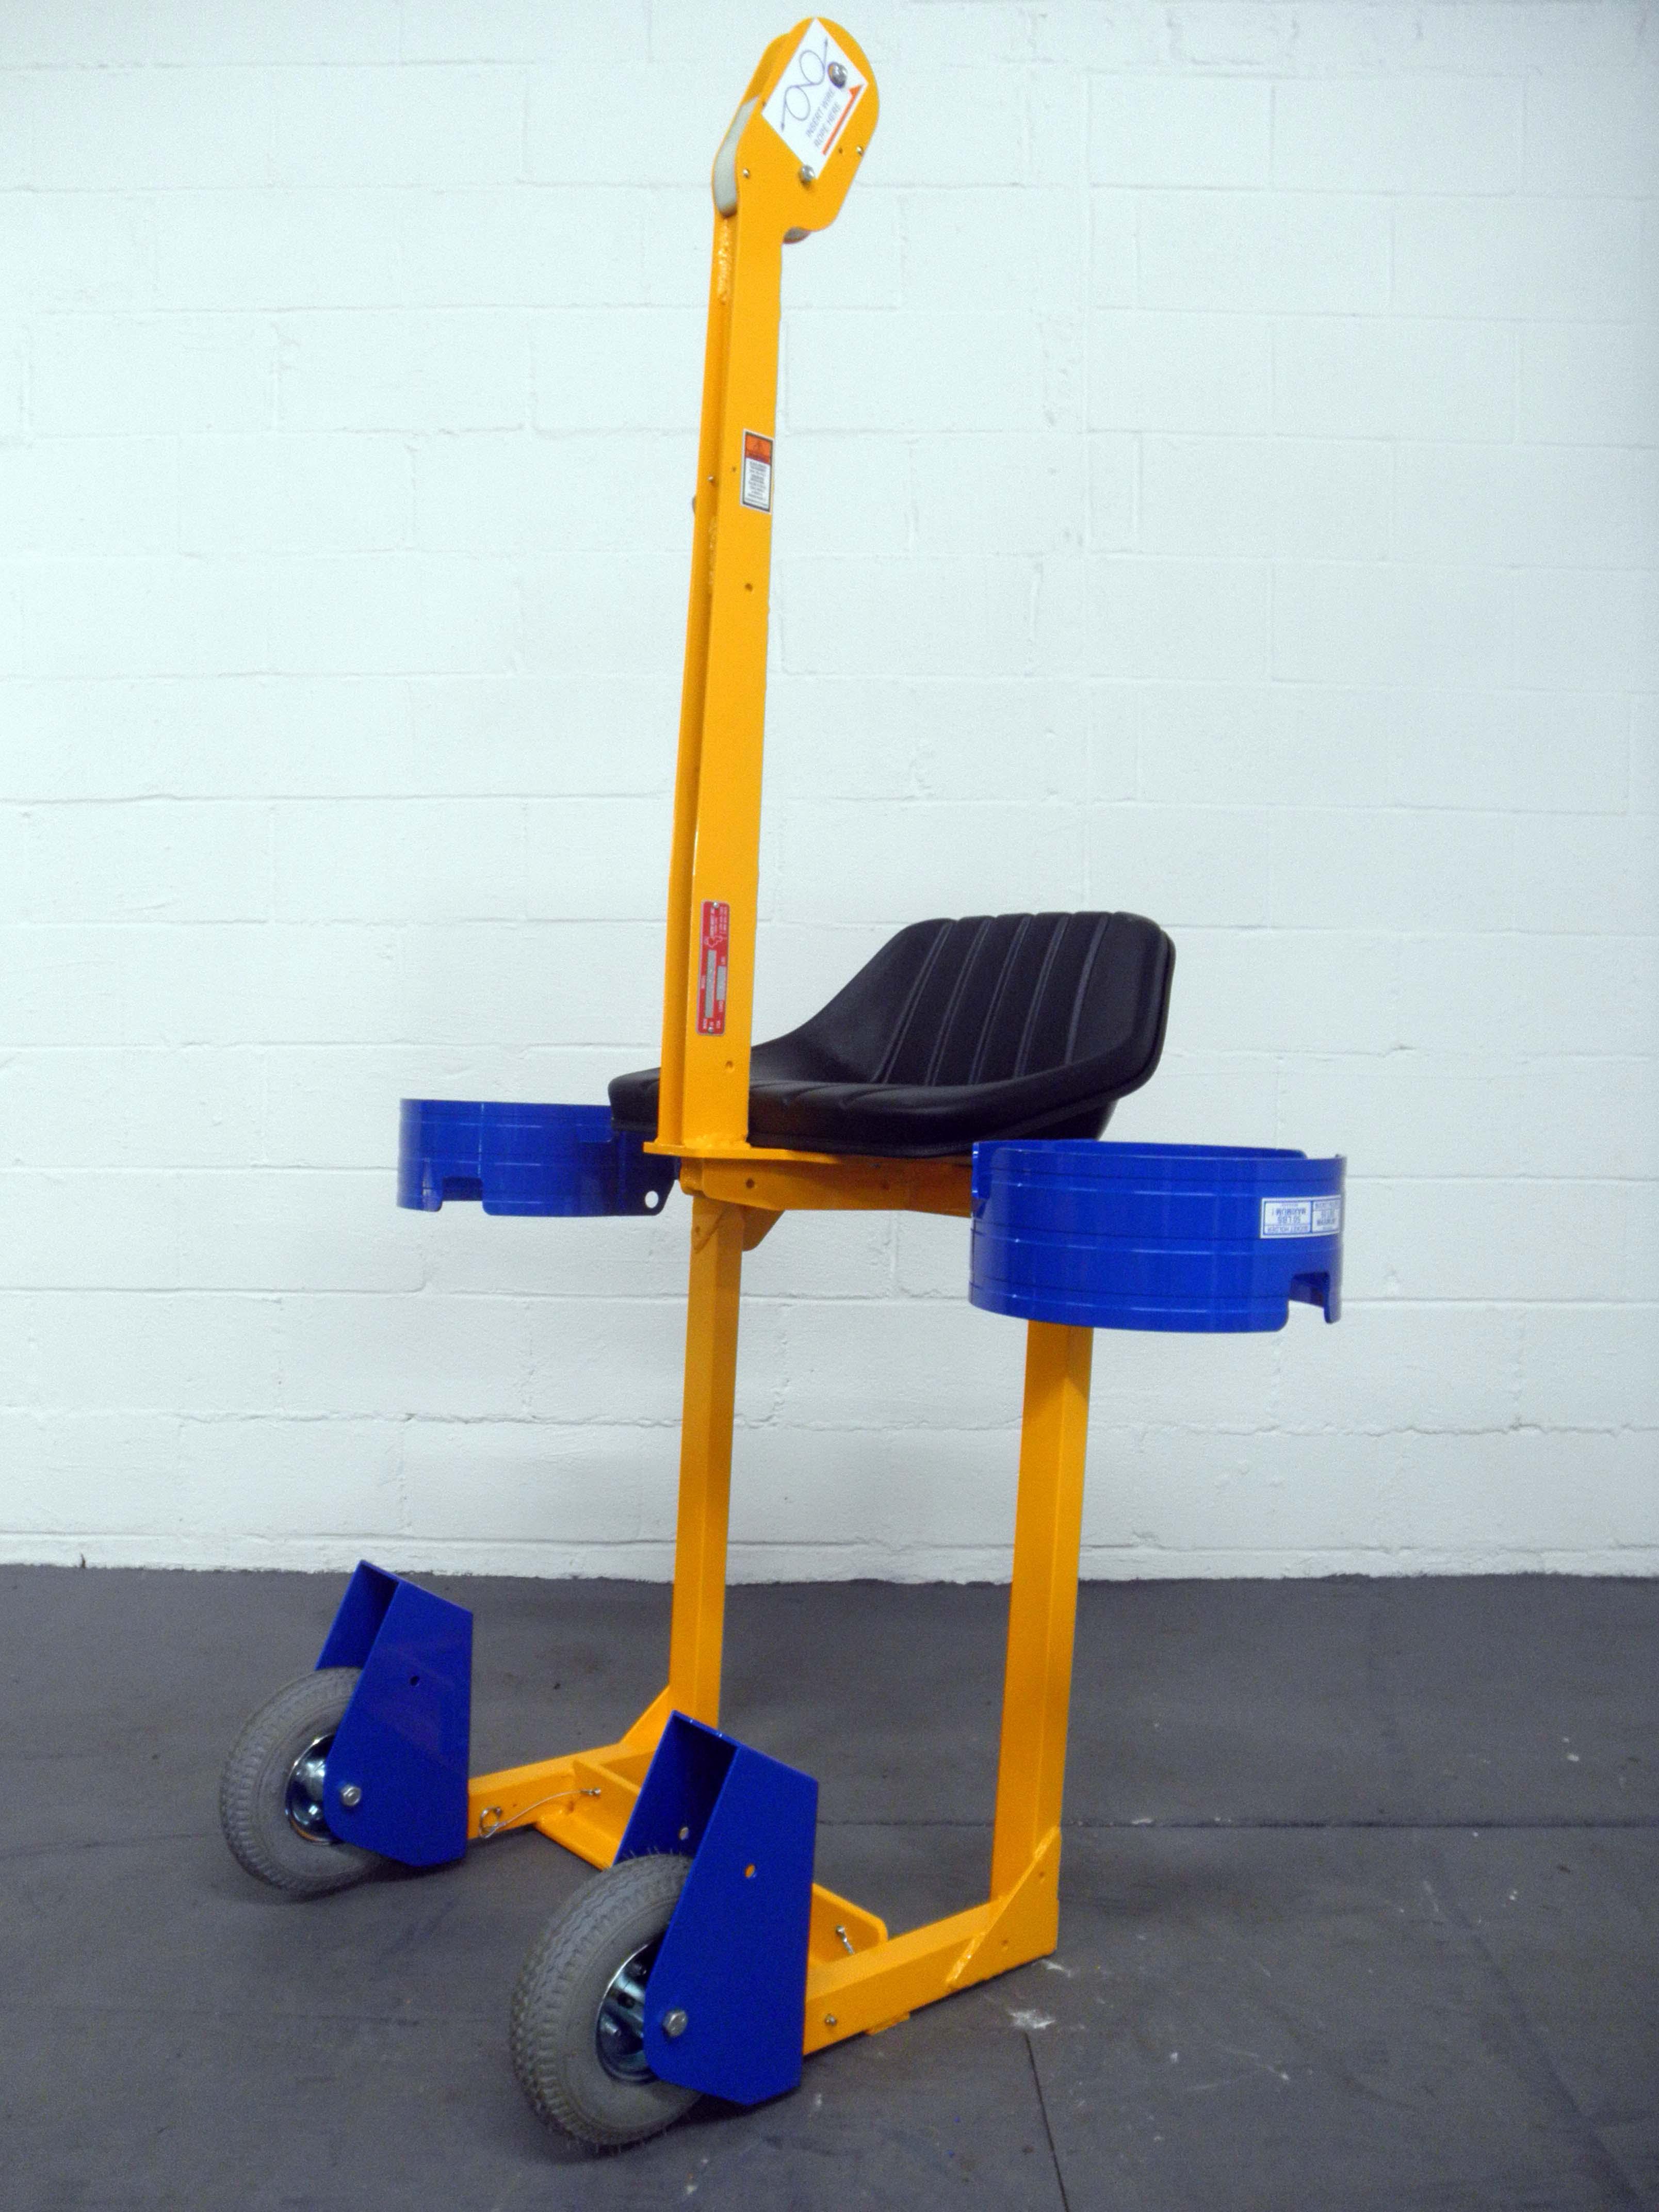 bosun chair rental yoga ball desk benefits 144 010 lisbon hoist